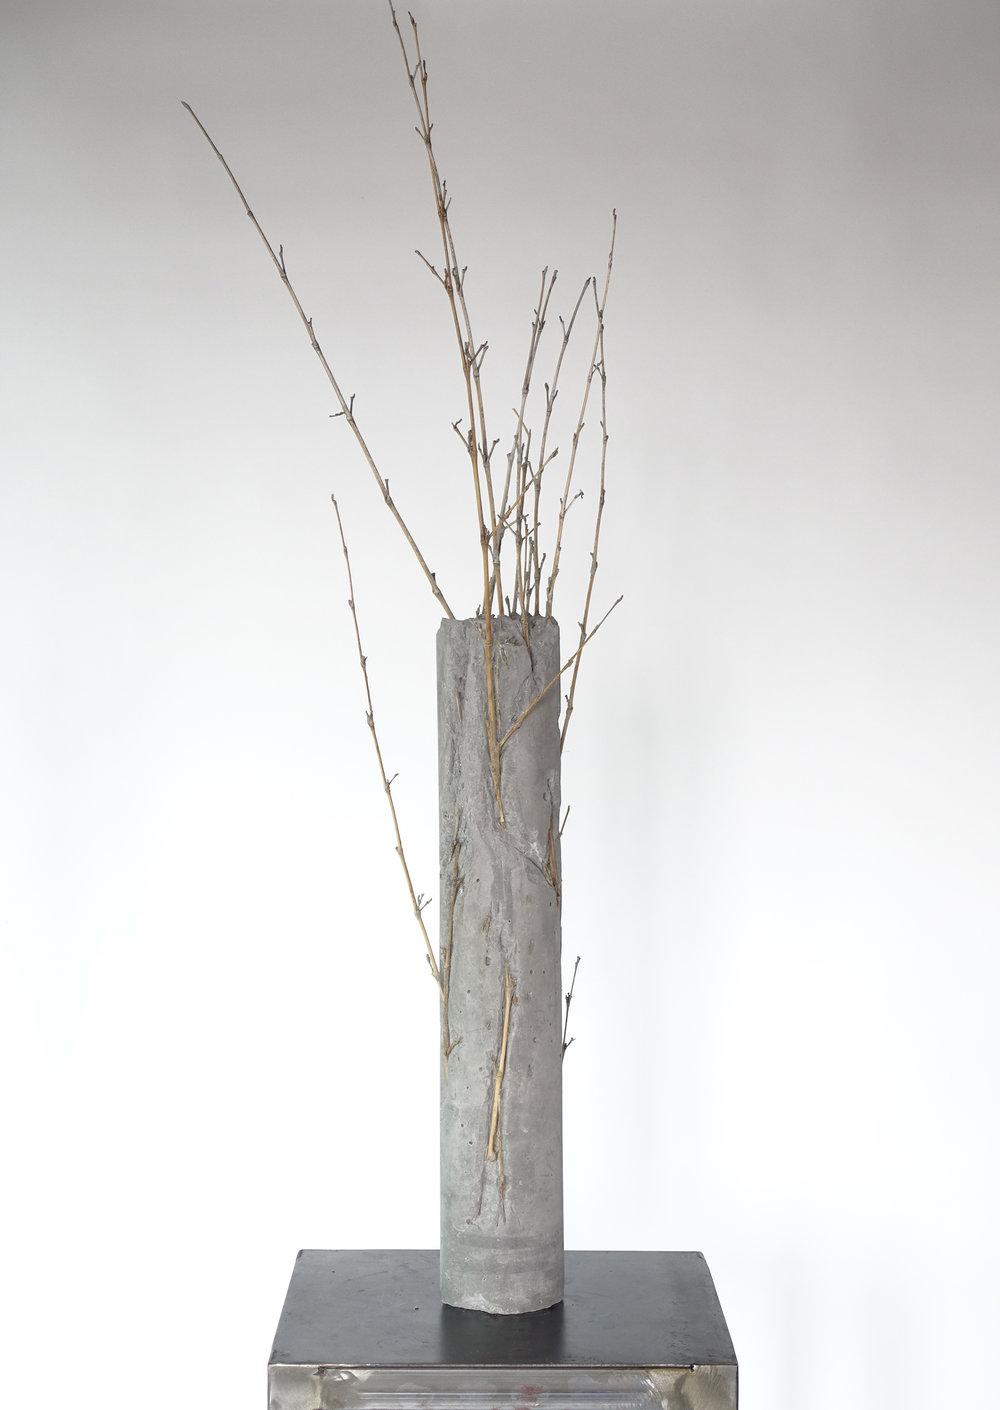 Still Life #6 Bamboo-Michele Tiberio.JPG